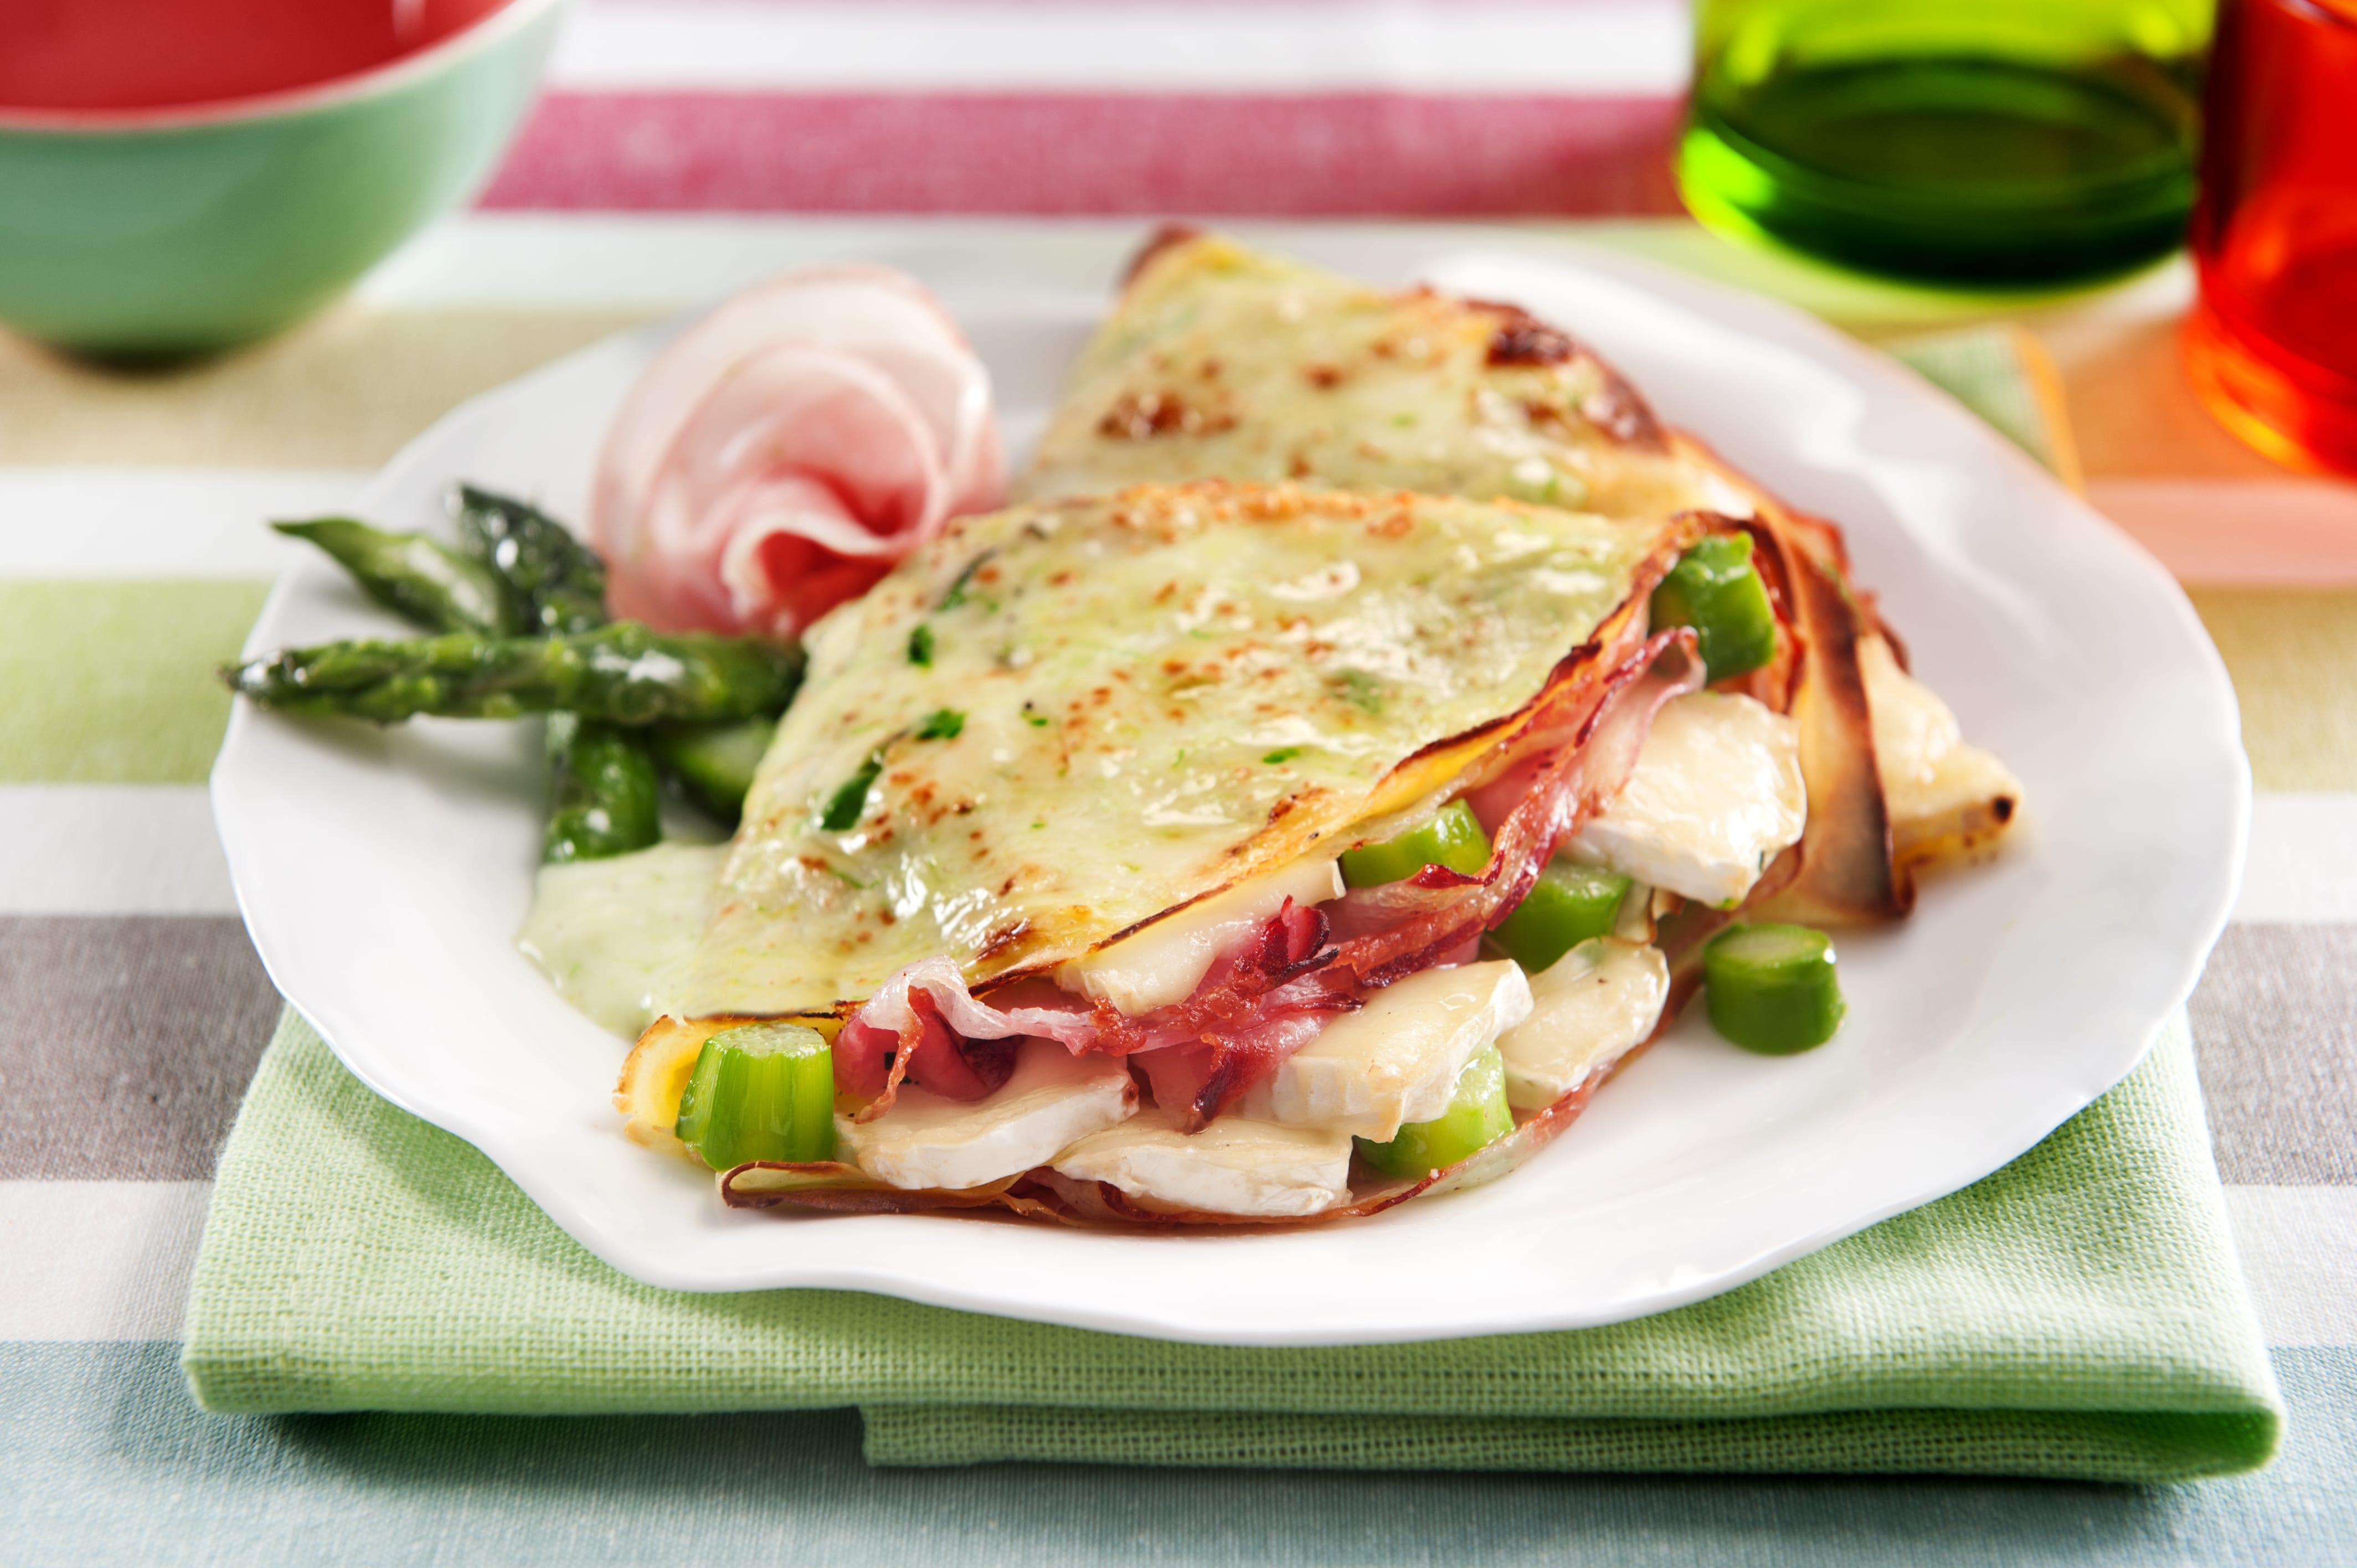 Crêpes gratinate con asparagi, pancetta arrotolata e brie